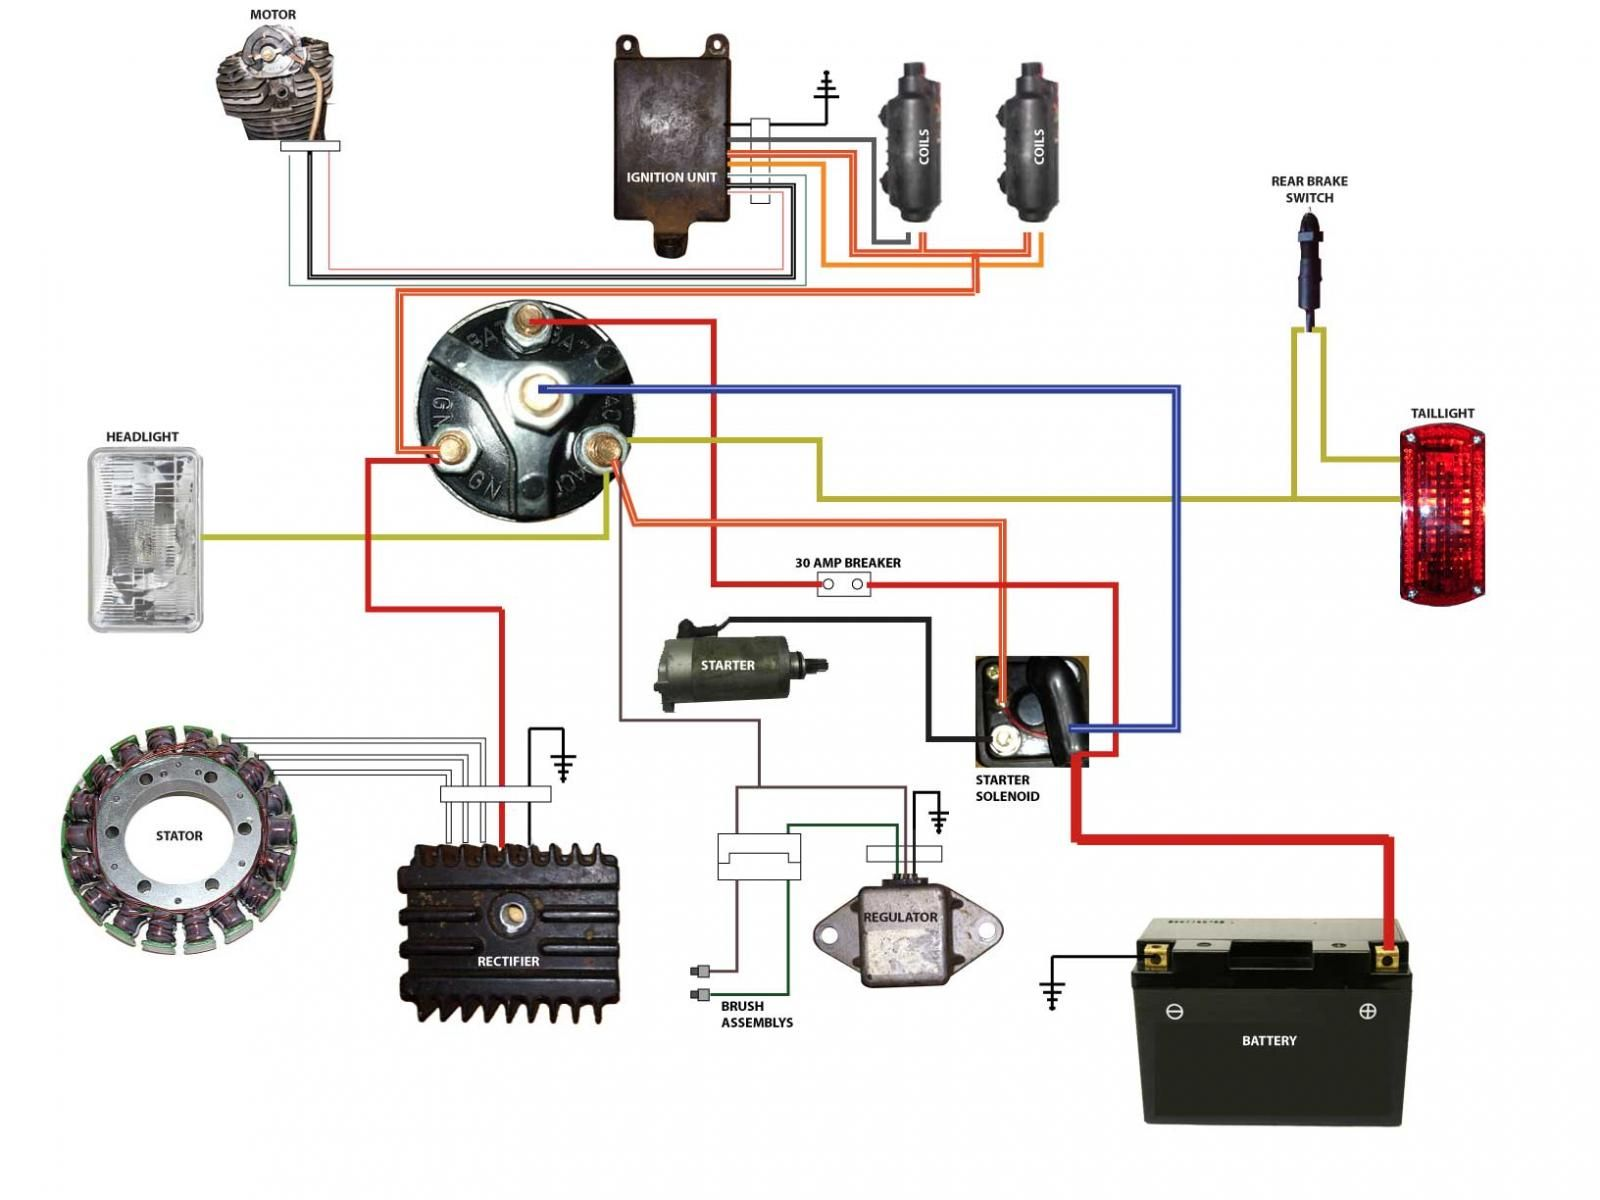 1979 Yamaha 650 Special Wiring Diagram 1978